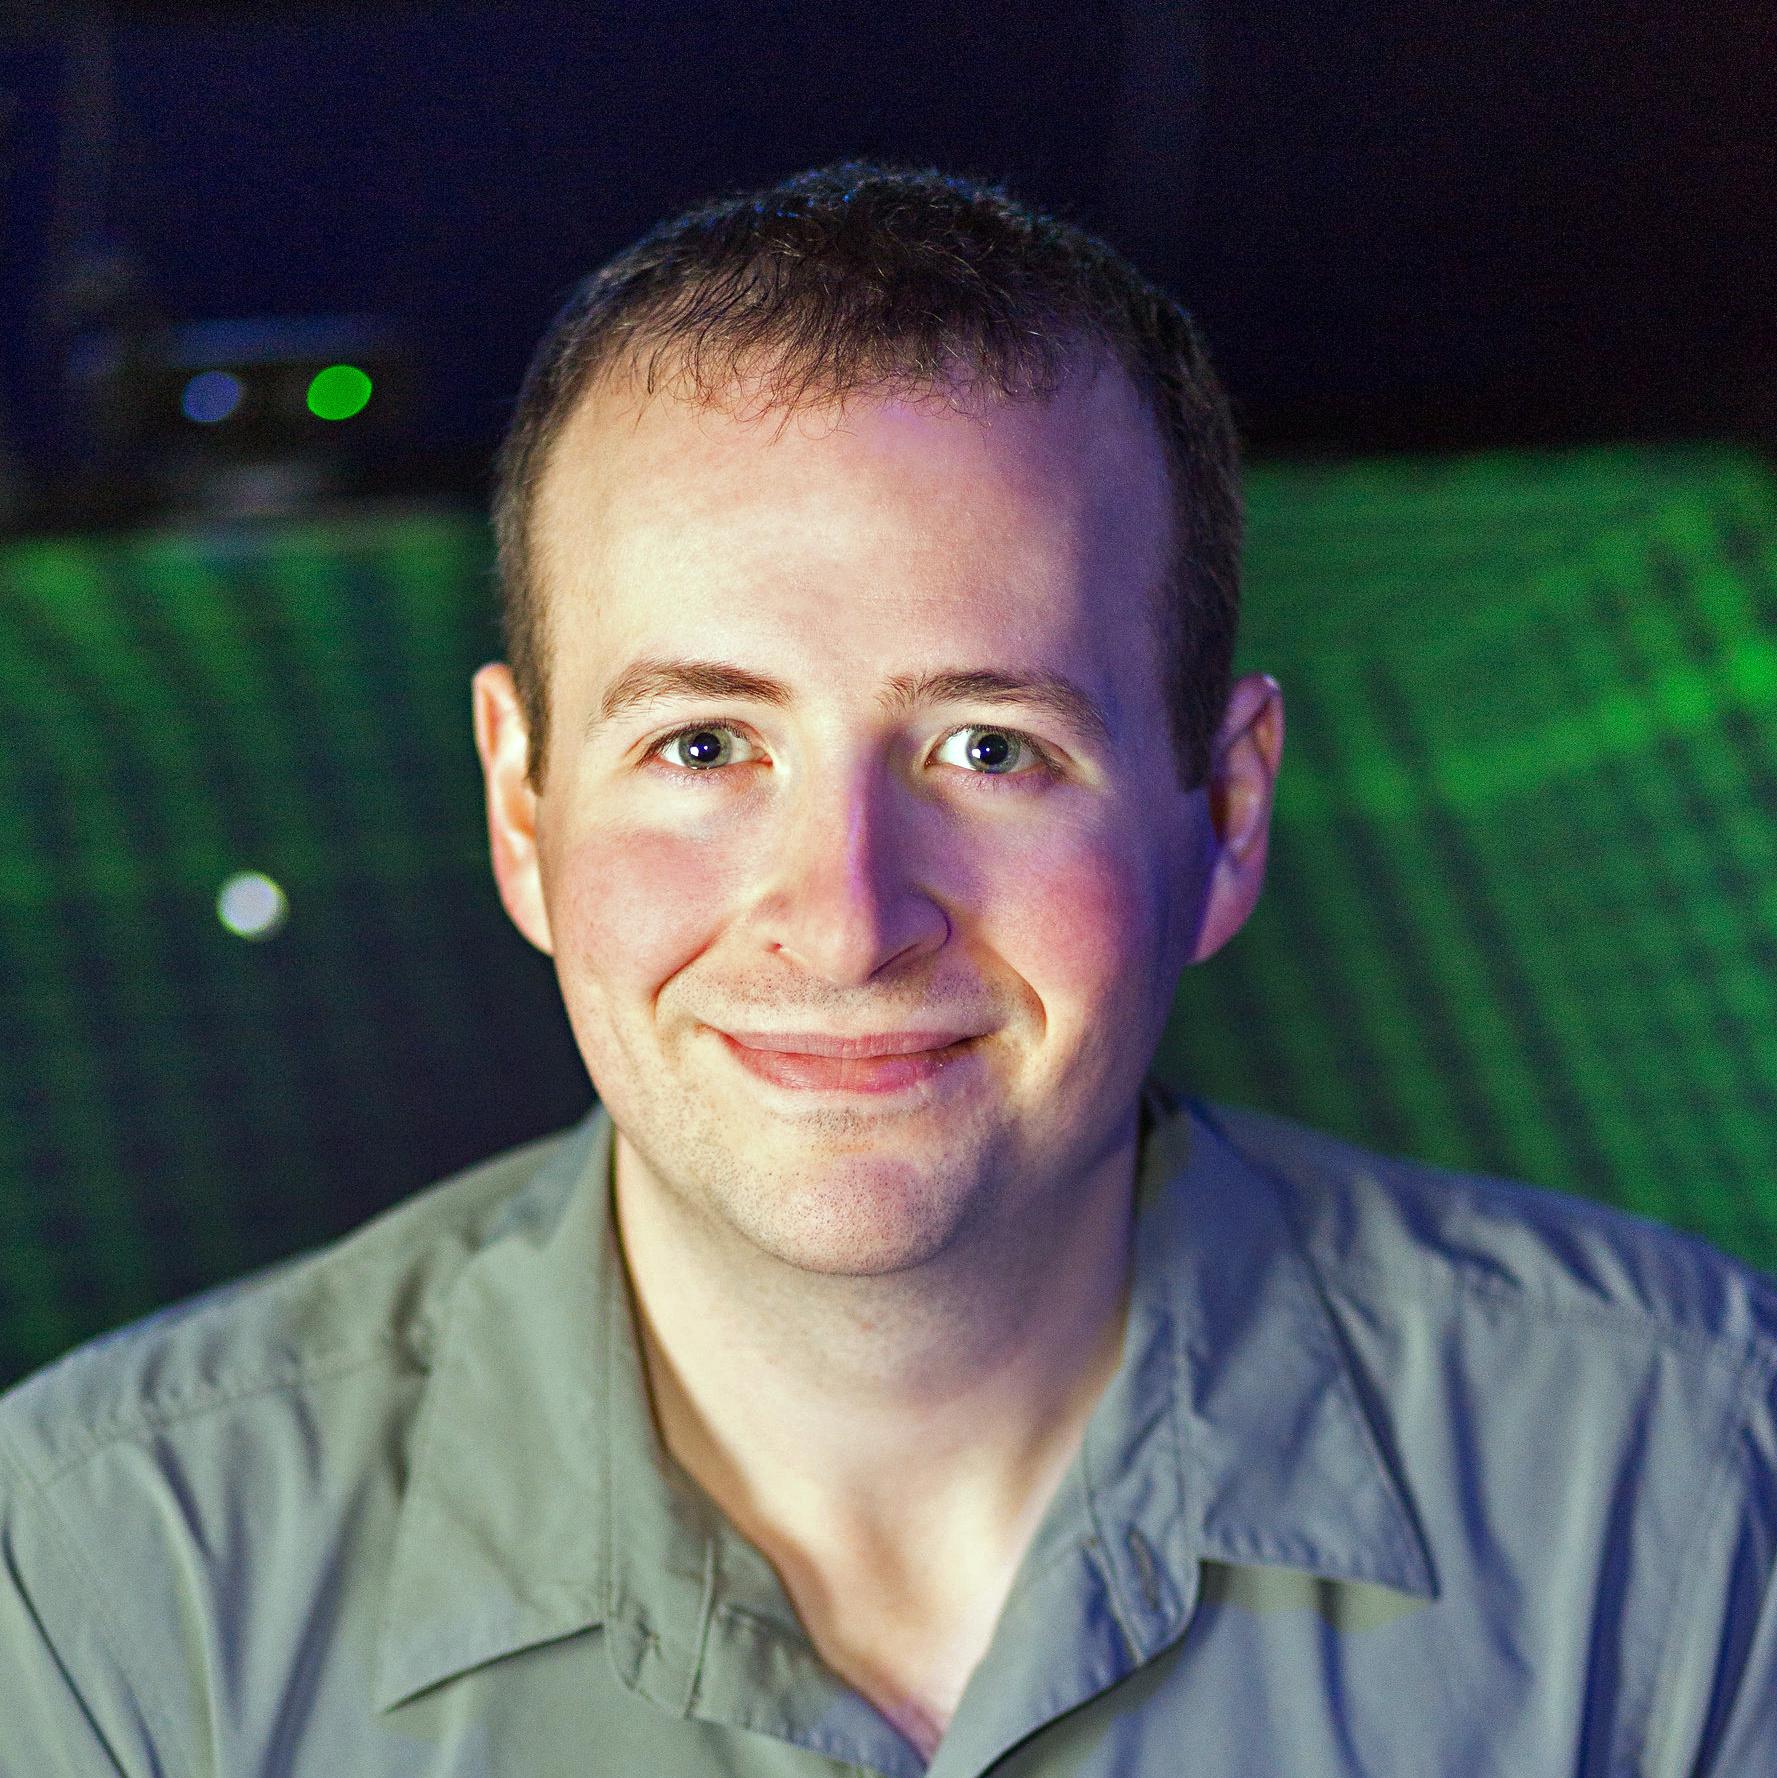 Guest Lecturer: Evan Suma Rosenberg, Ph.D.